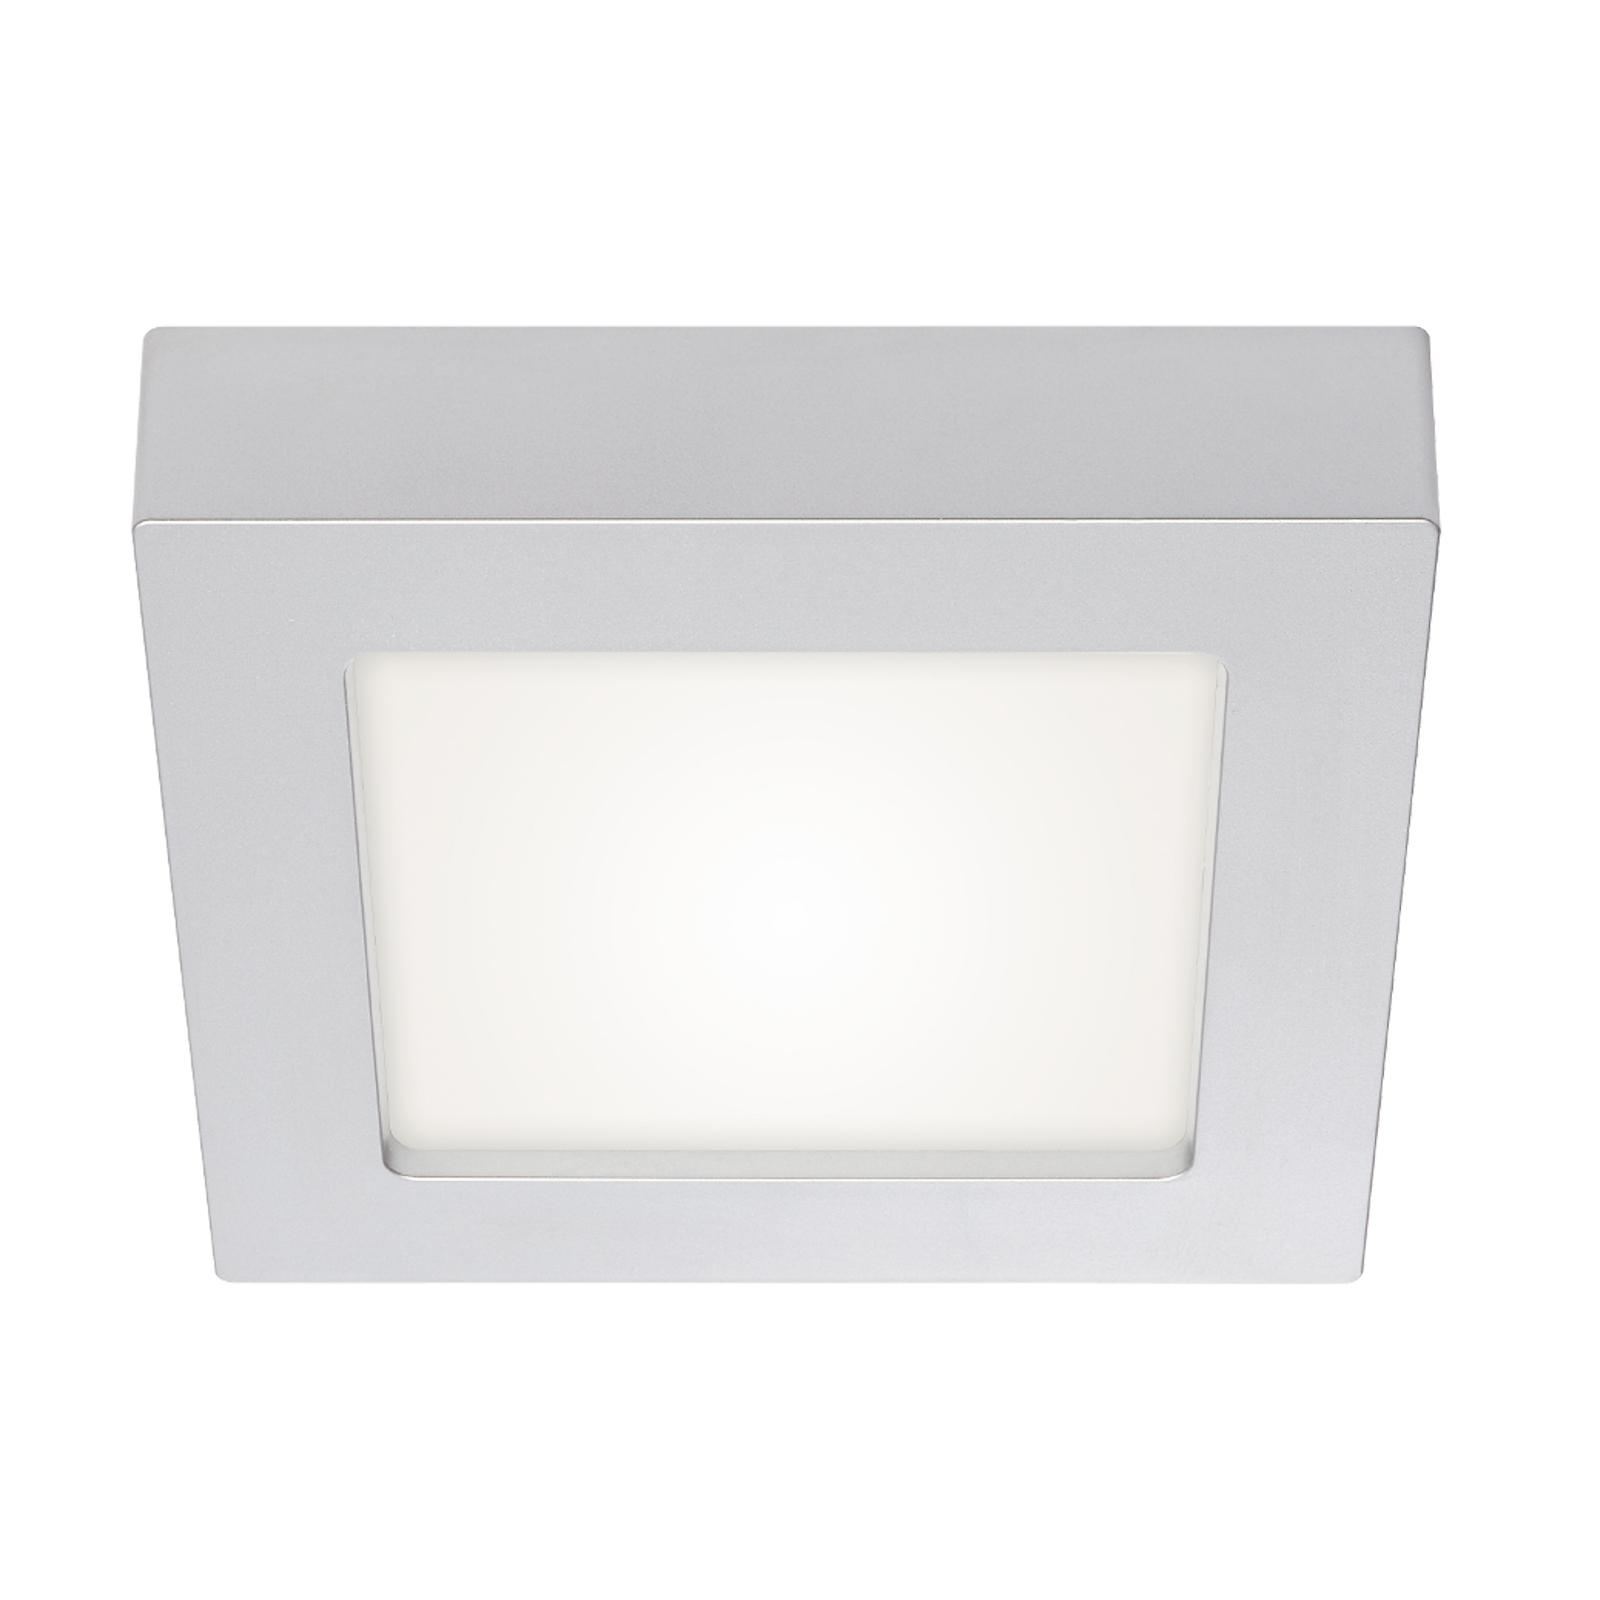 Prios Alette LED-taklampe, sølv, 17,2 cm